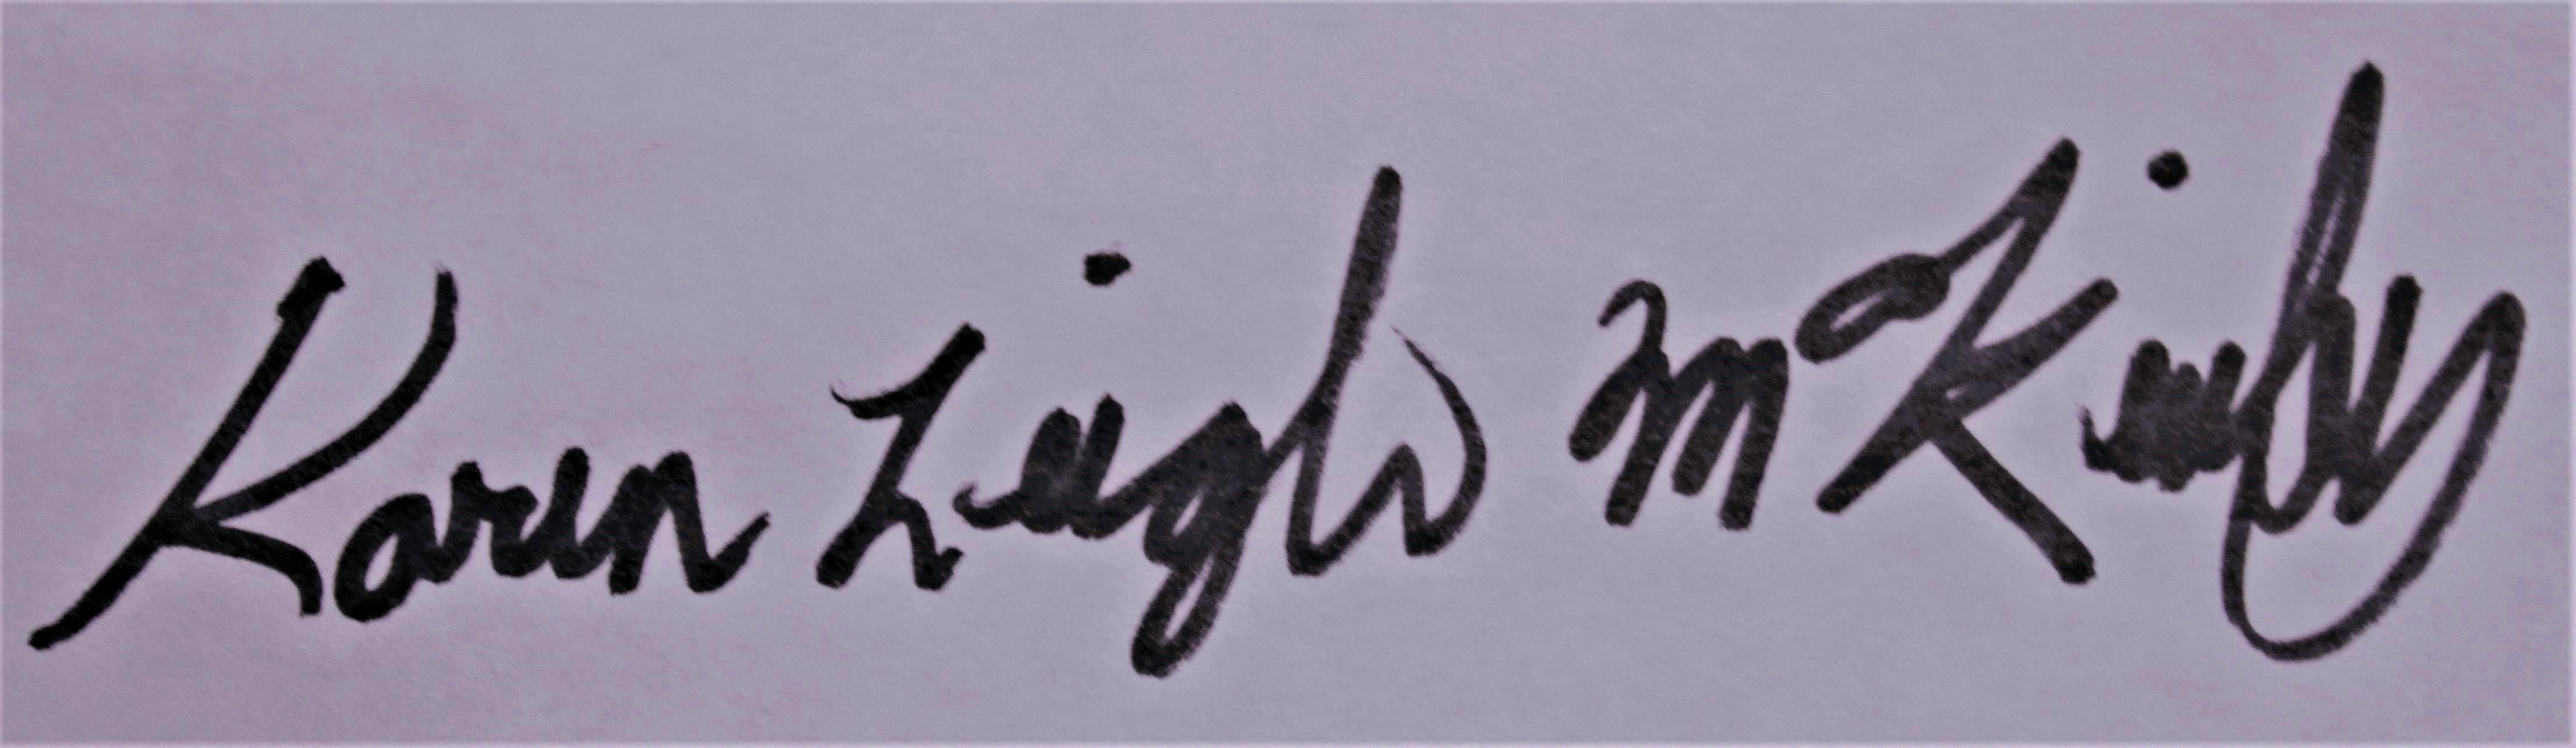 karen leigh mckinley's Signature